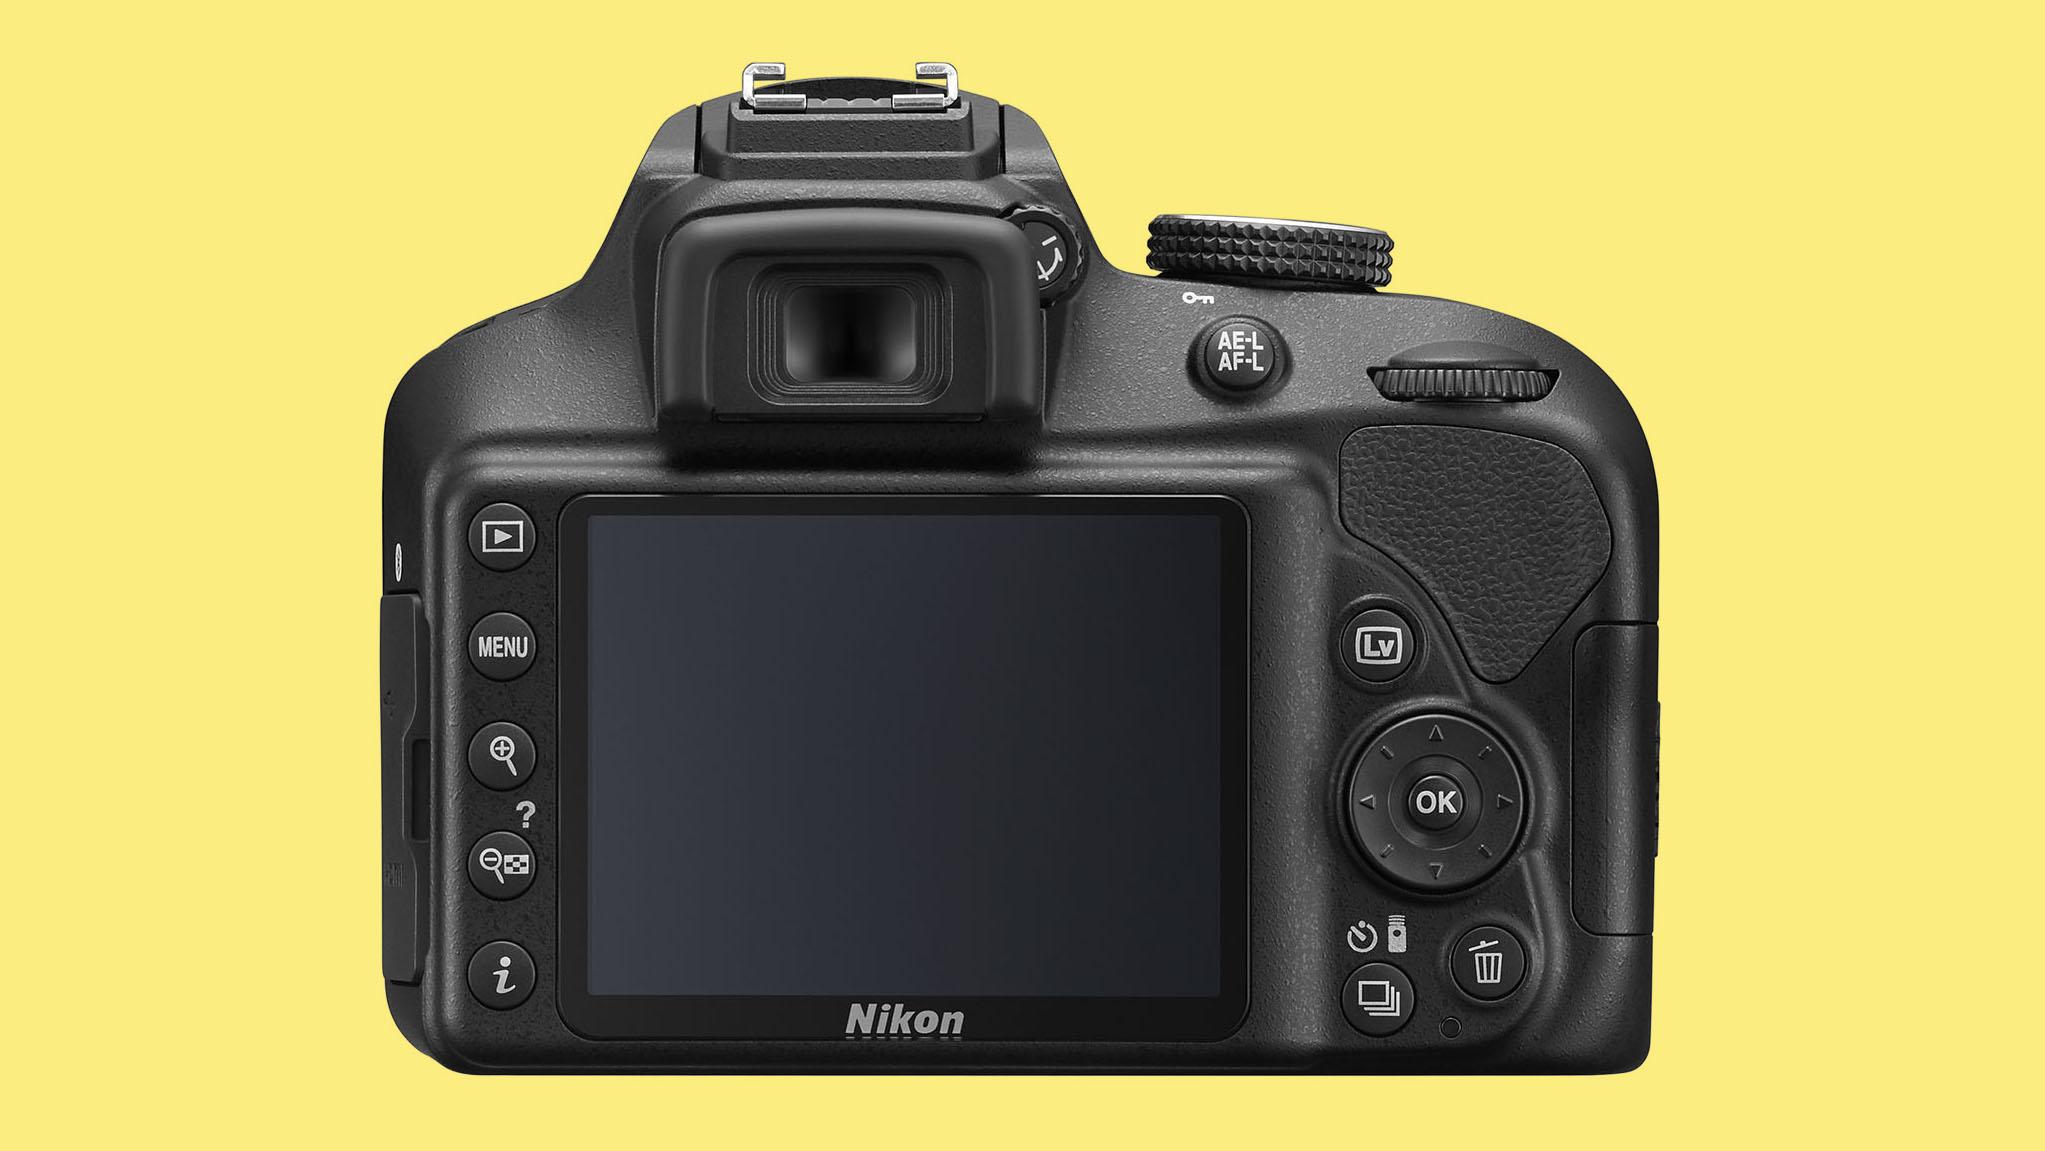 Nikond D3400